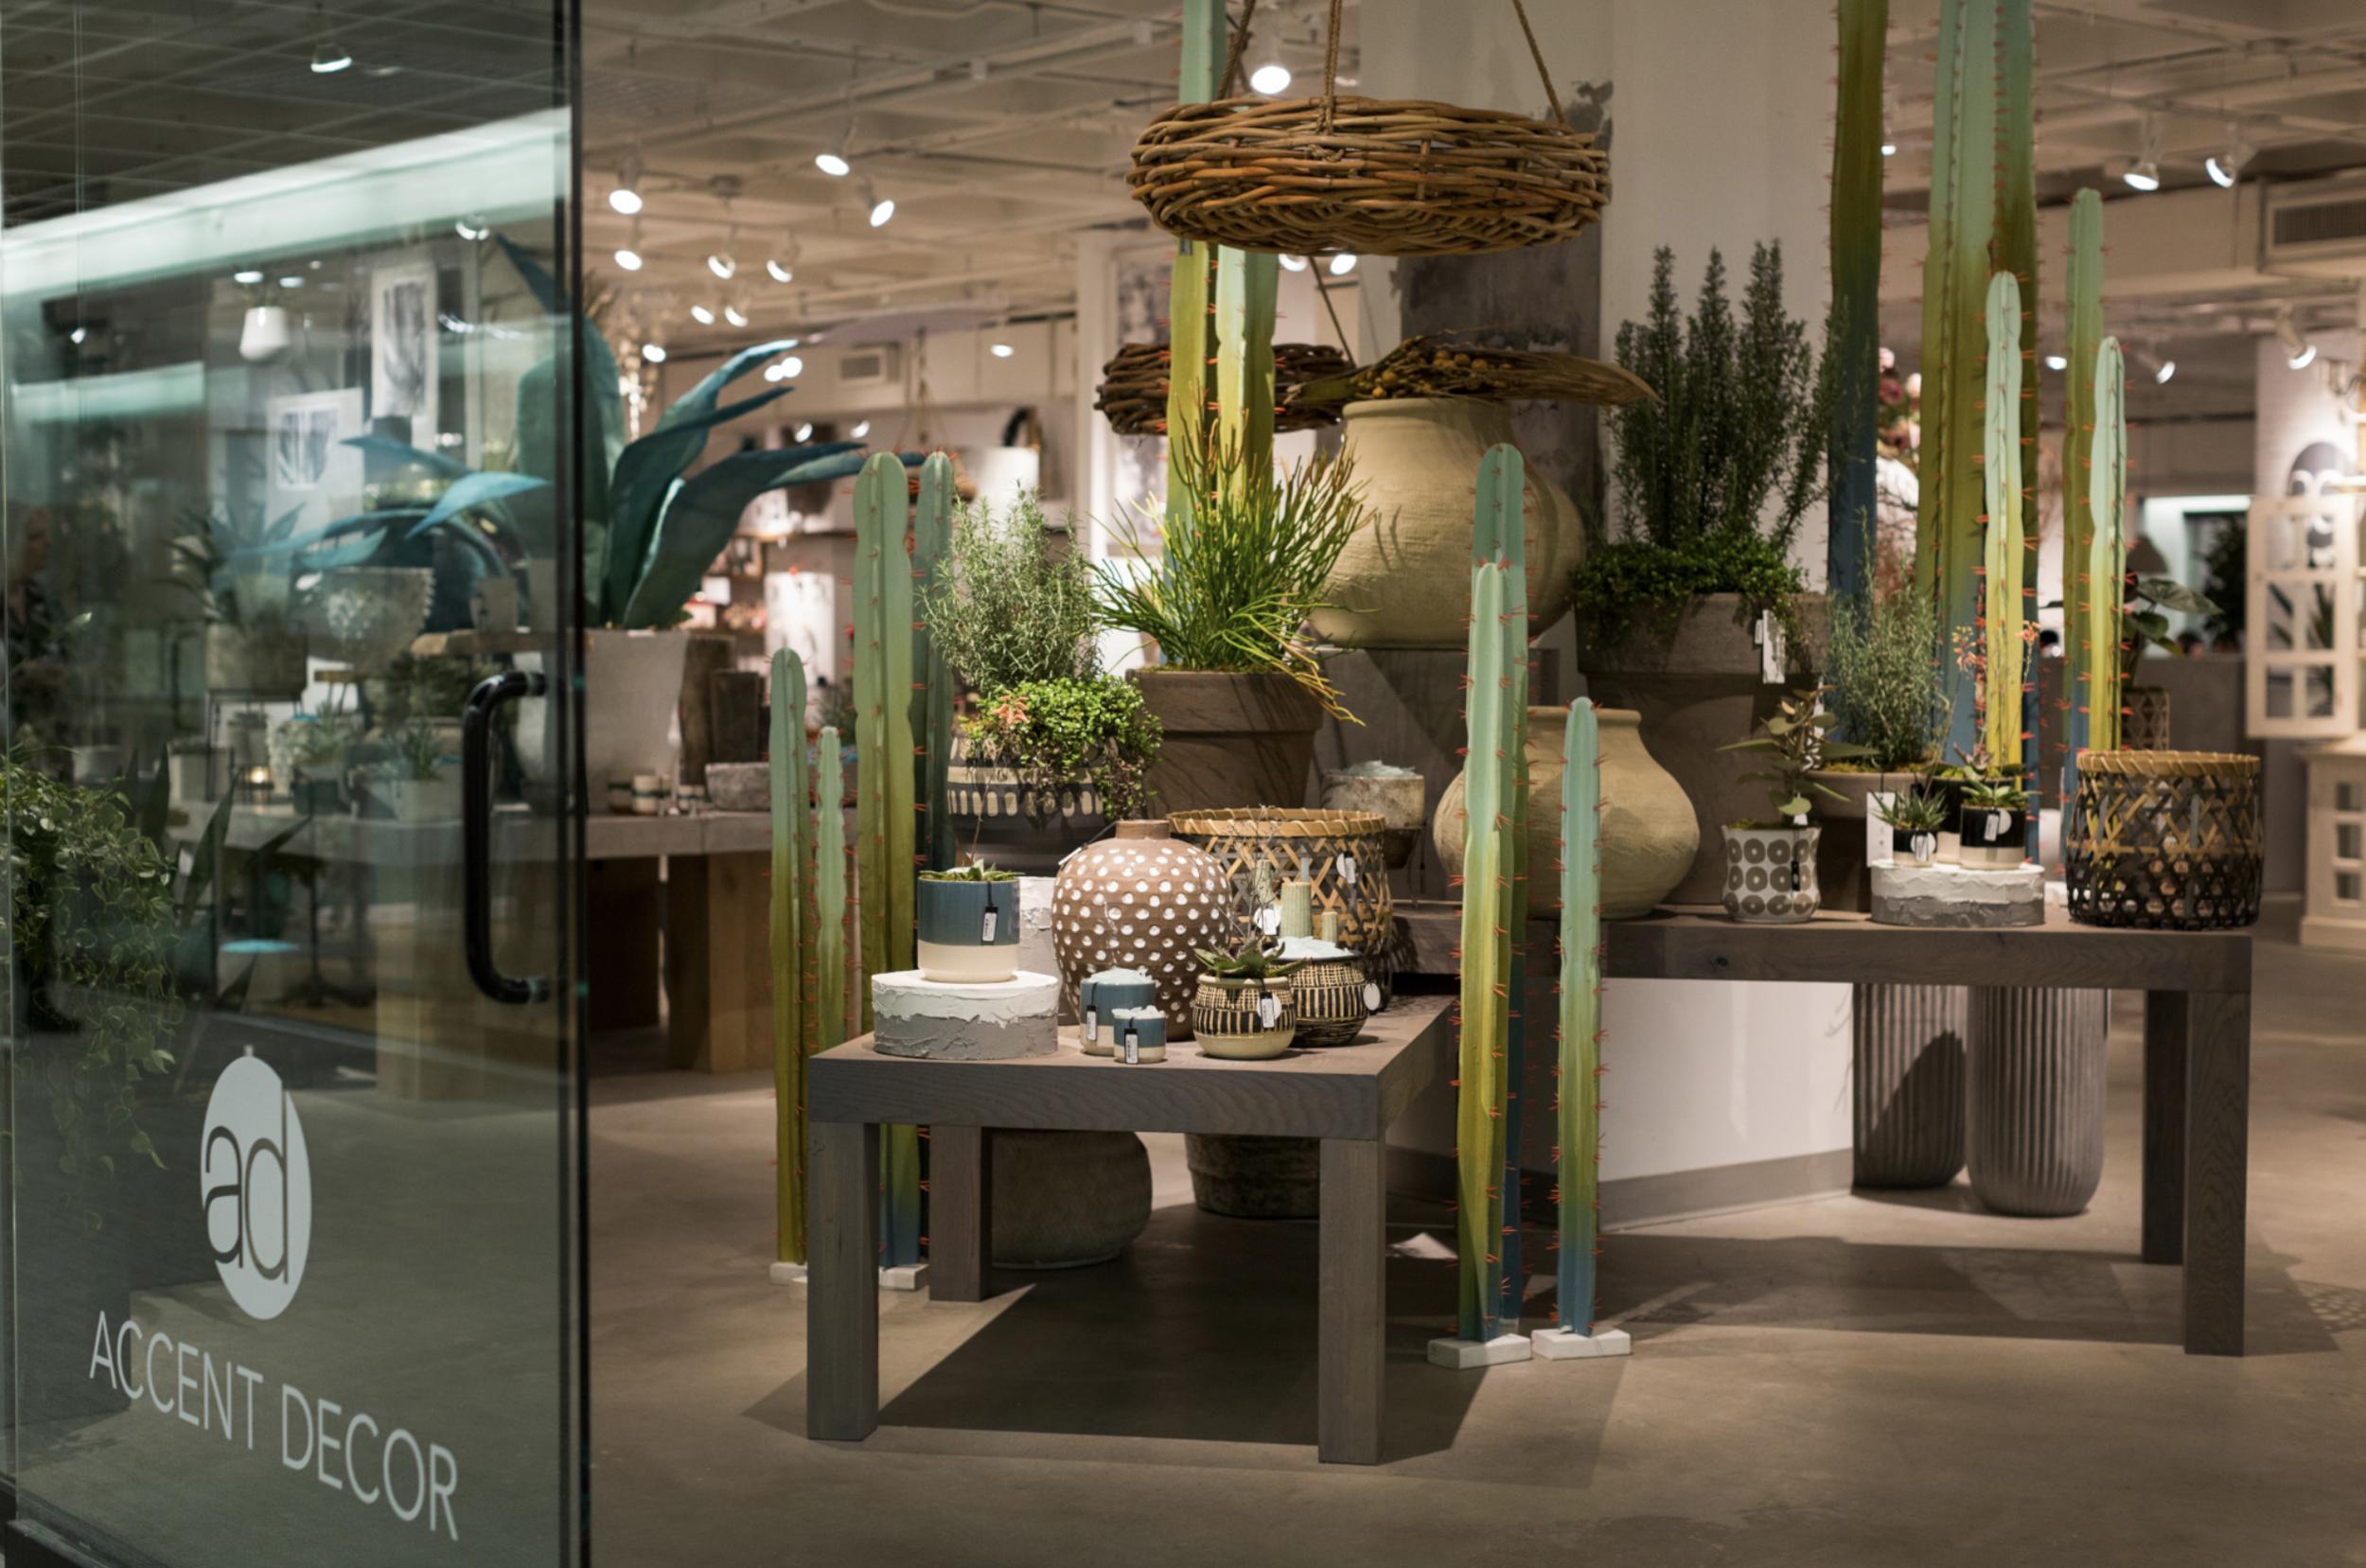 cacti ad showroom atl.png